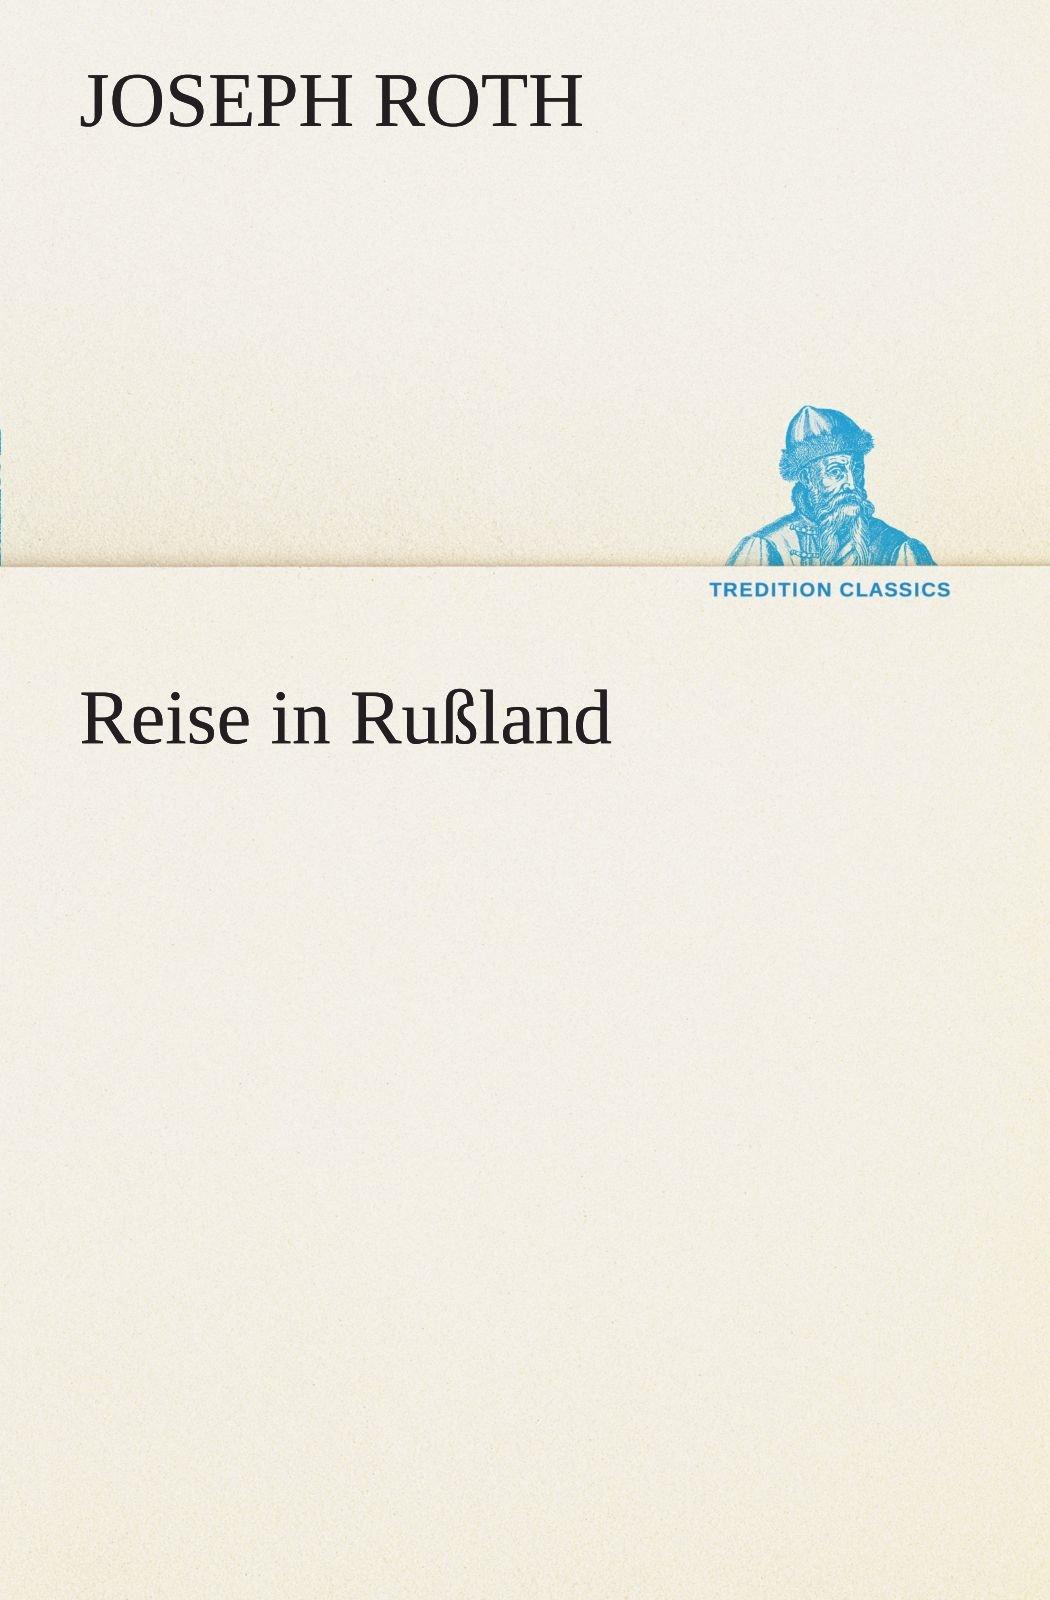 Reise in Rußland (TREDITION CLASSICS) (German Edition) PDF